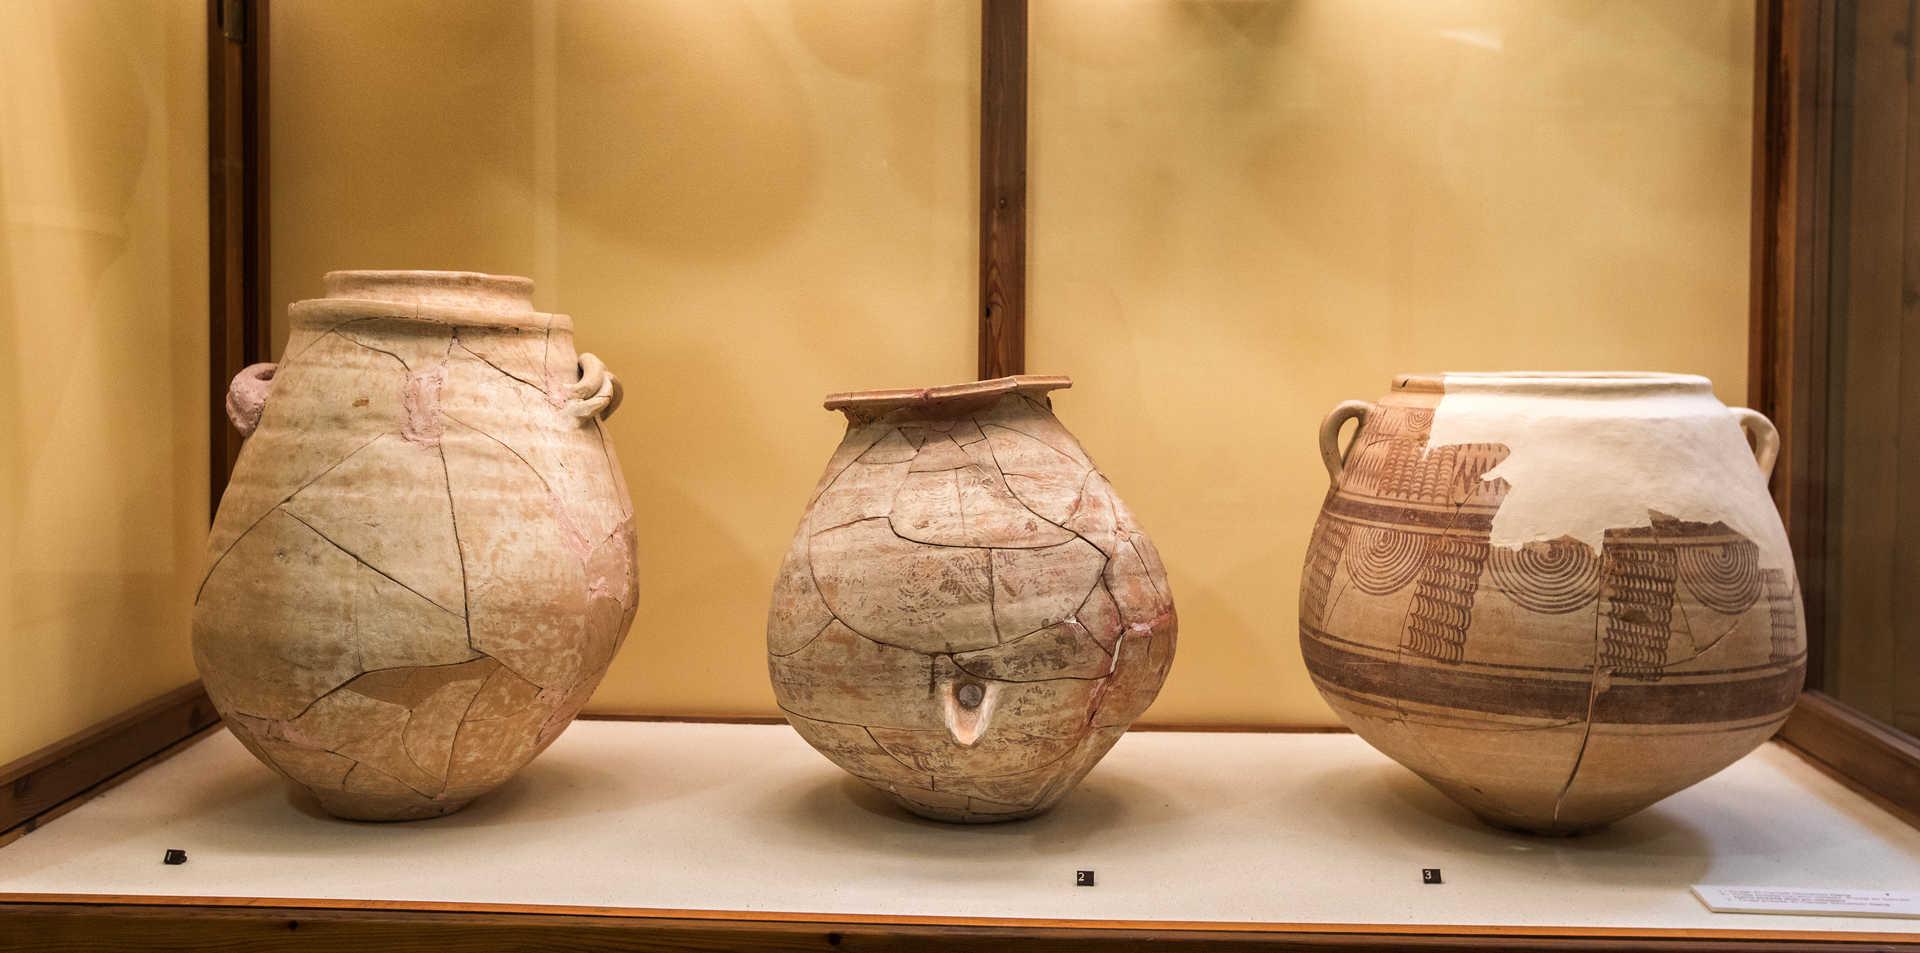 MUSEO HISTÓRICO-ARTÍSTICO